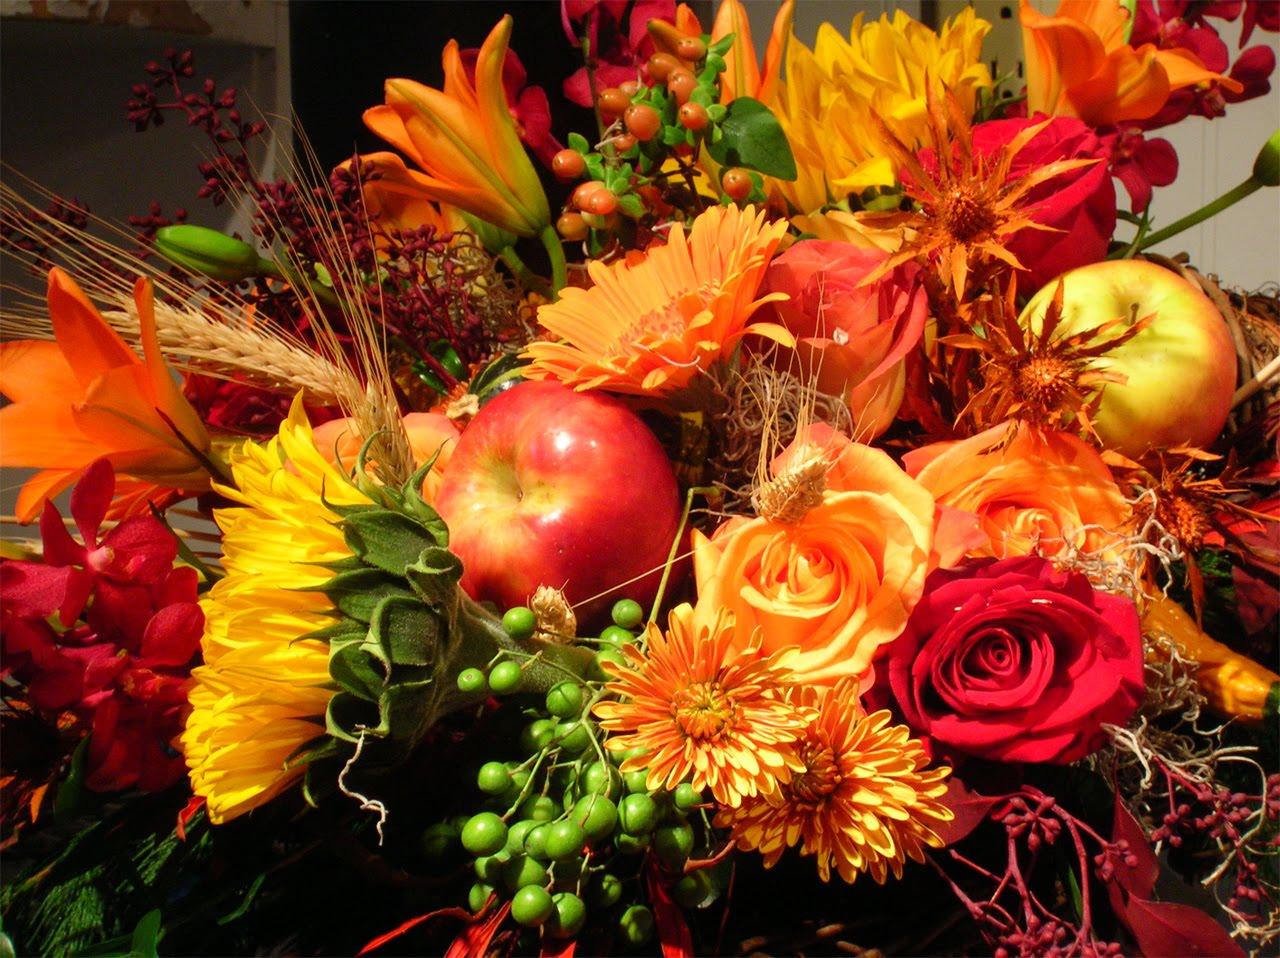 Download Thanksgiving Flower Wallpaper Thanksgiving Sunflower 1280x958